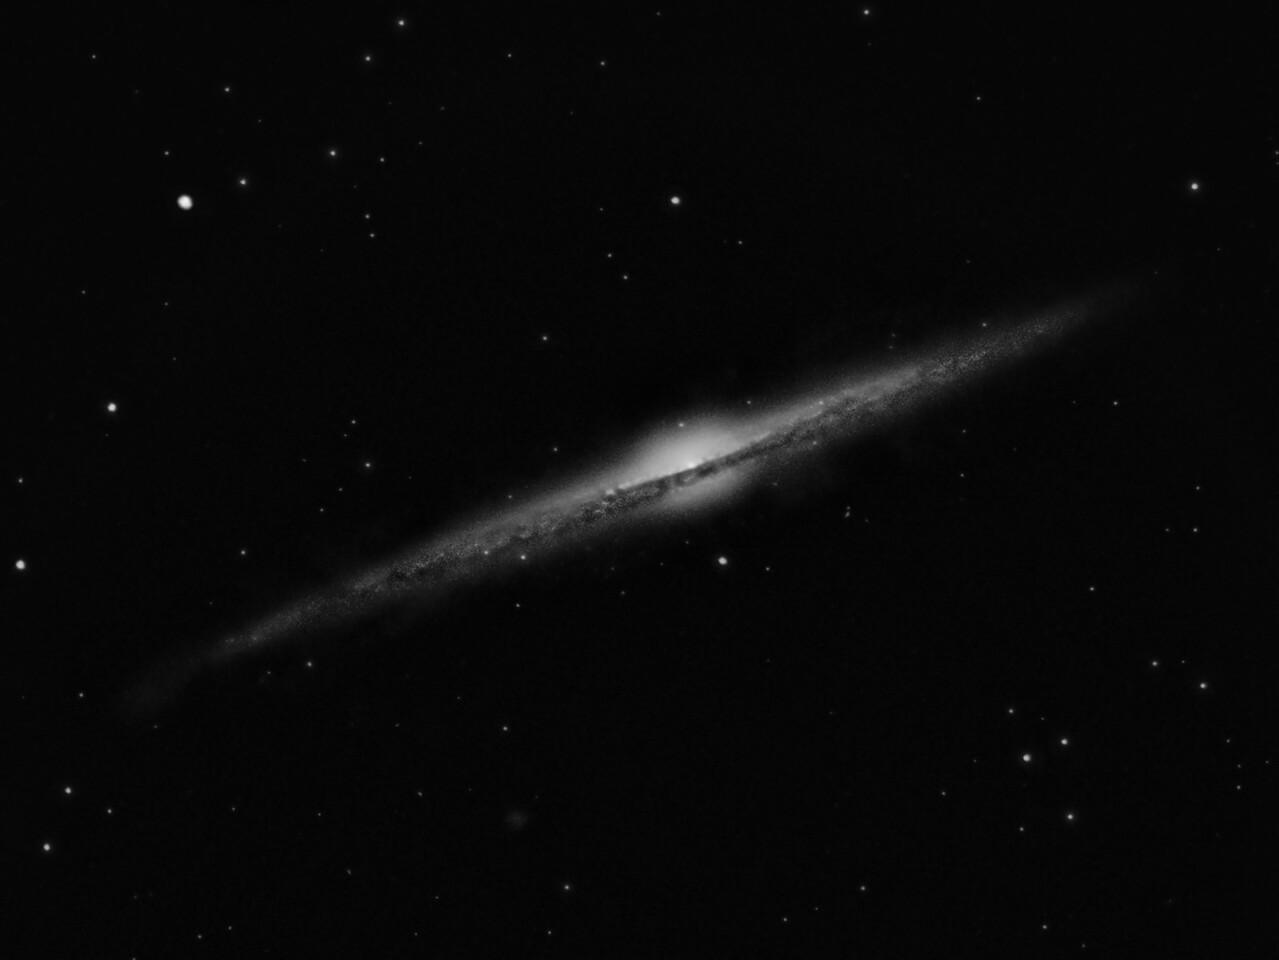 Needle Galaxy   Location: Gibsonia, PA   Equipment: ATIK 383L Camera  Nexstar 11 GPS  Multiple 300 sec. exposures with a Light Pollution Filter   Software: Maxim DL Photoshop CS5